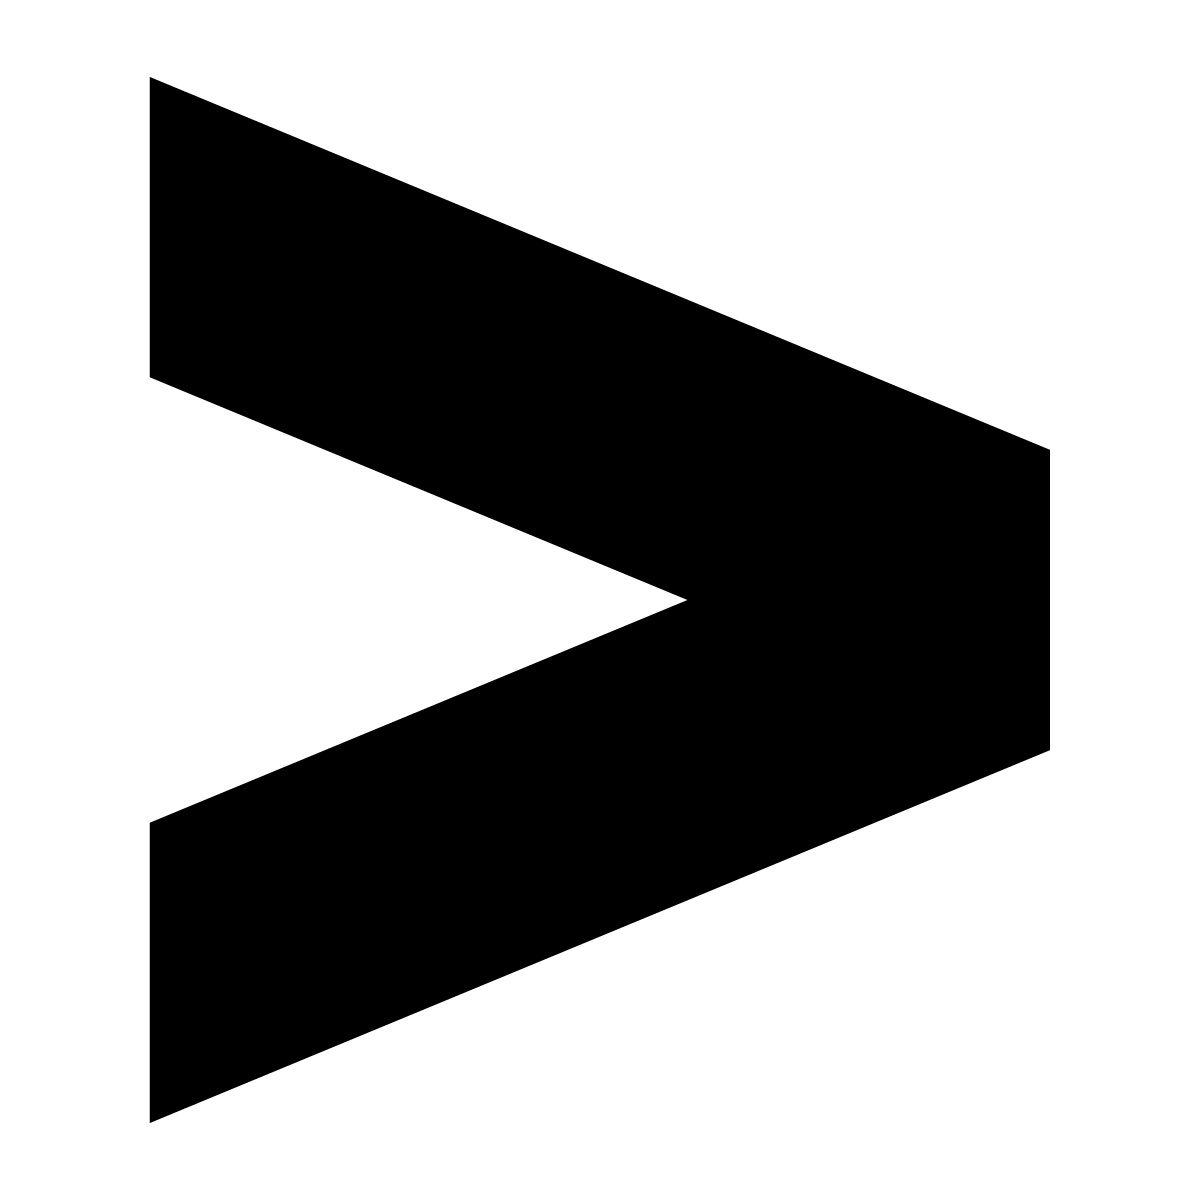 Source Http Www Abcteach Com Documents Clip Art Math Symbols Less Than Or Equal To Sign Bw 19256 Sigil Symbols Clip Art